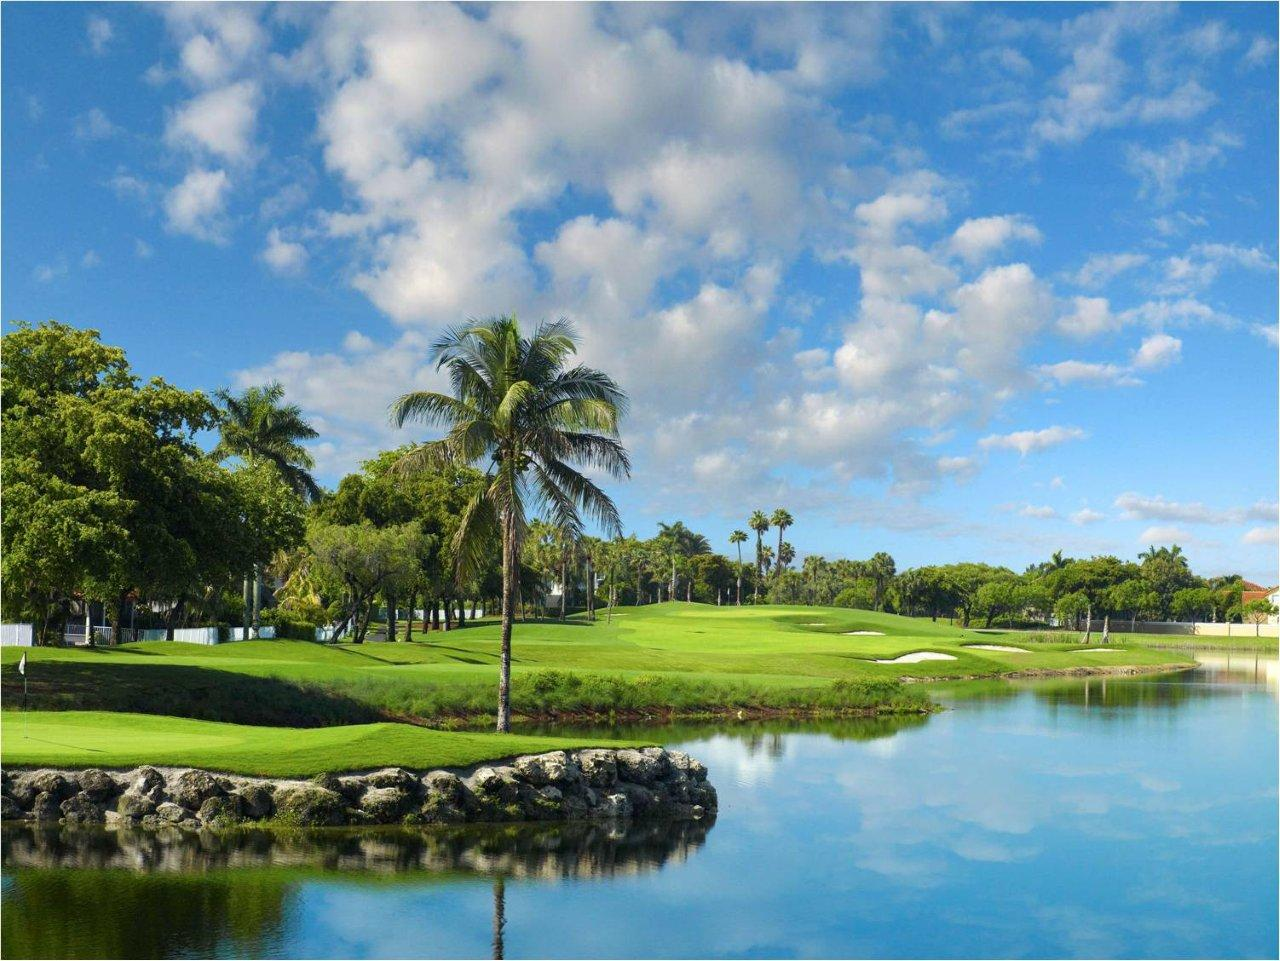 Doral Golf Resort and Spa